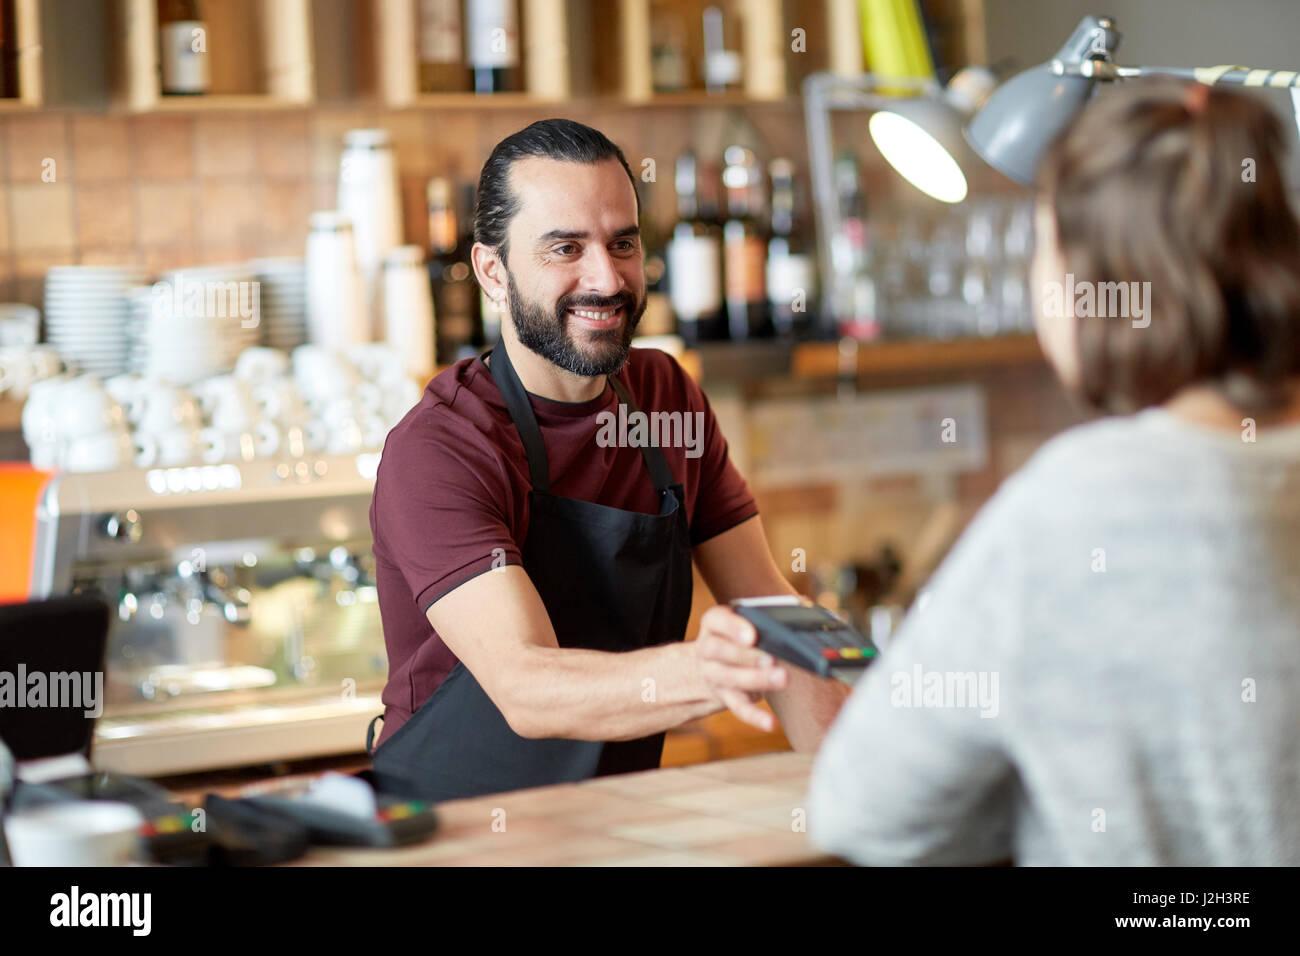 man or waiter with card reader and customer at bar Stock Photo